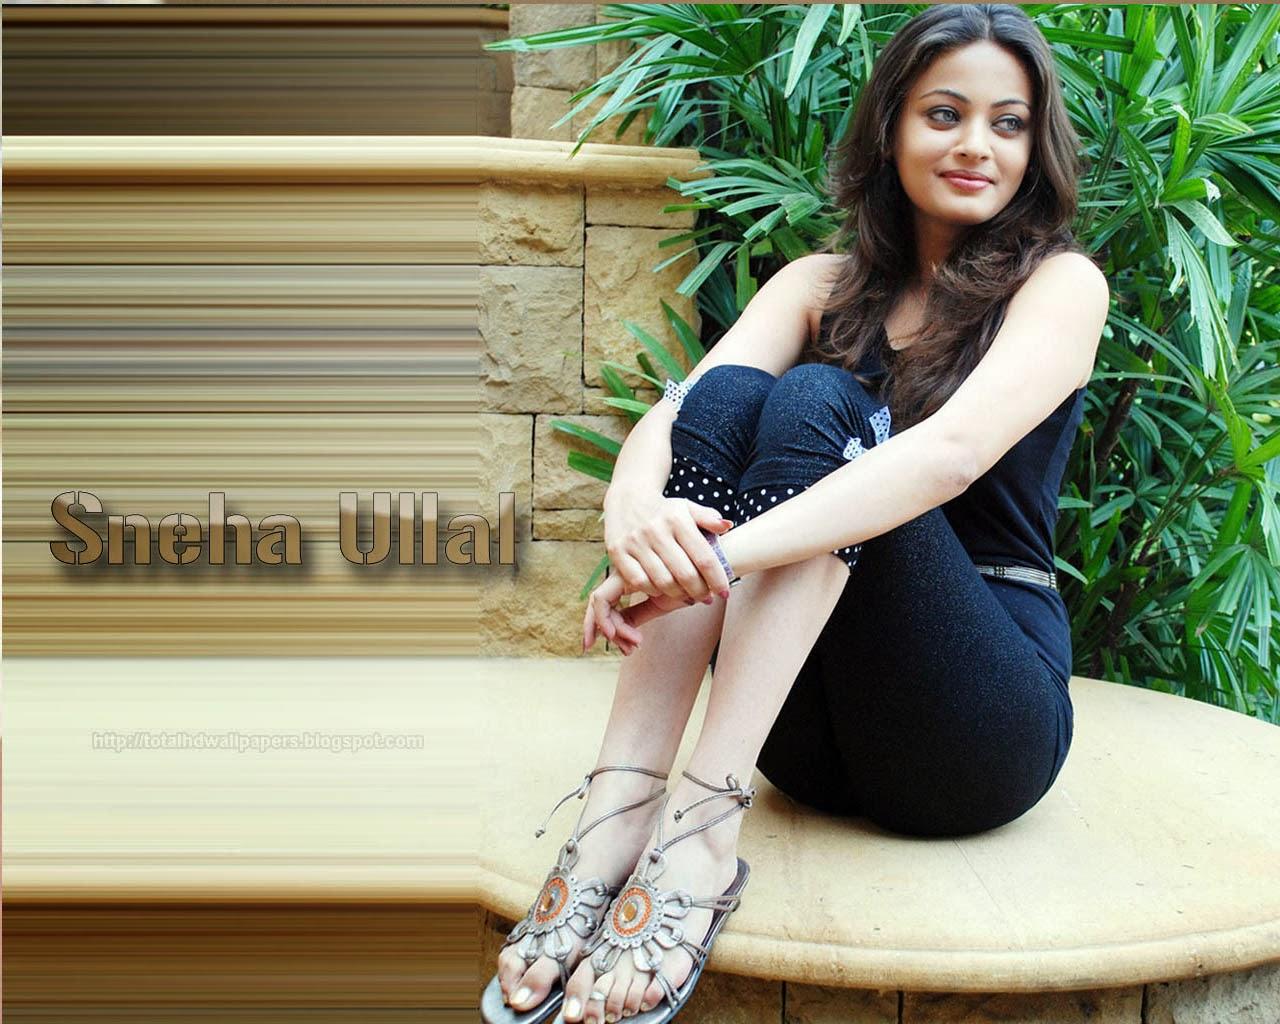 Sneha Ullal Hd Wallpaper - Sneha Feets , HD Wallpaper & Backgrounds